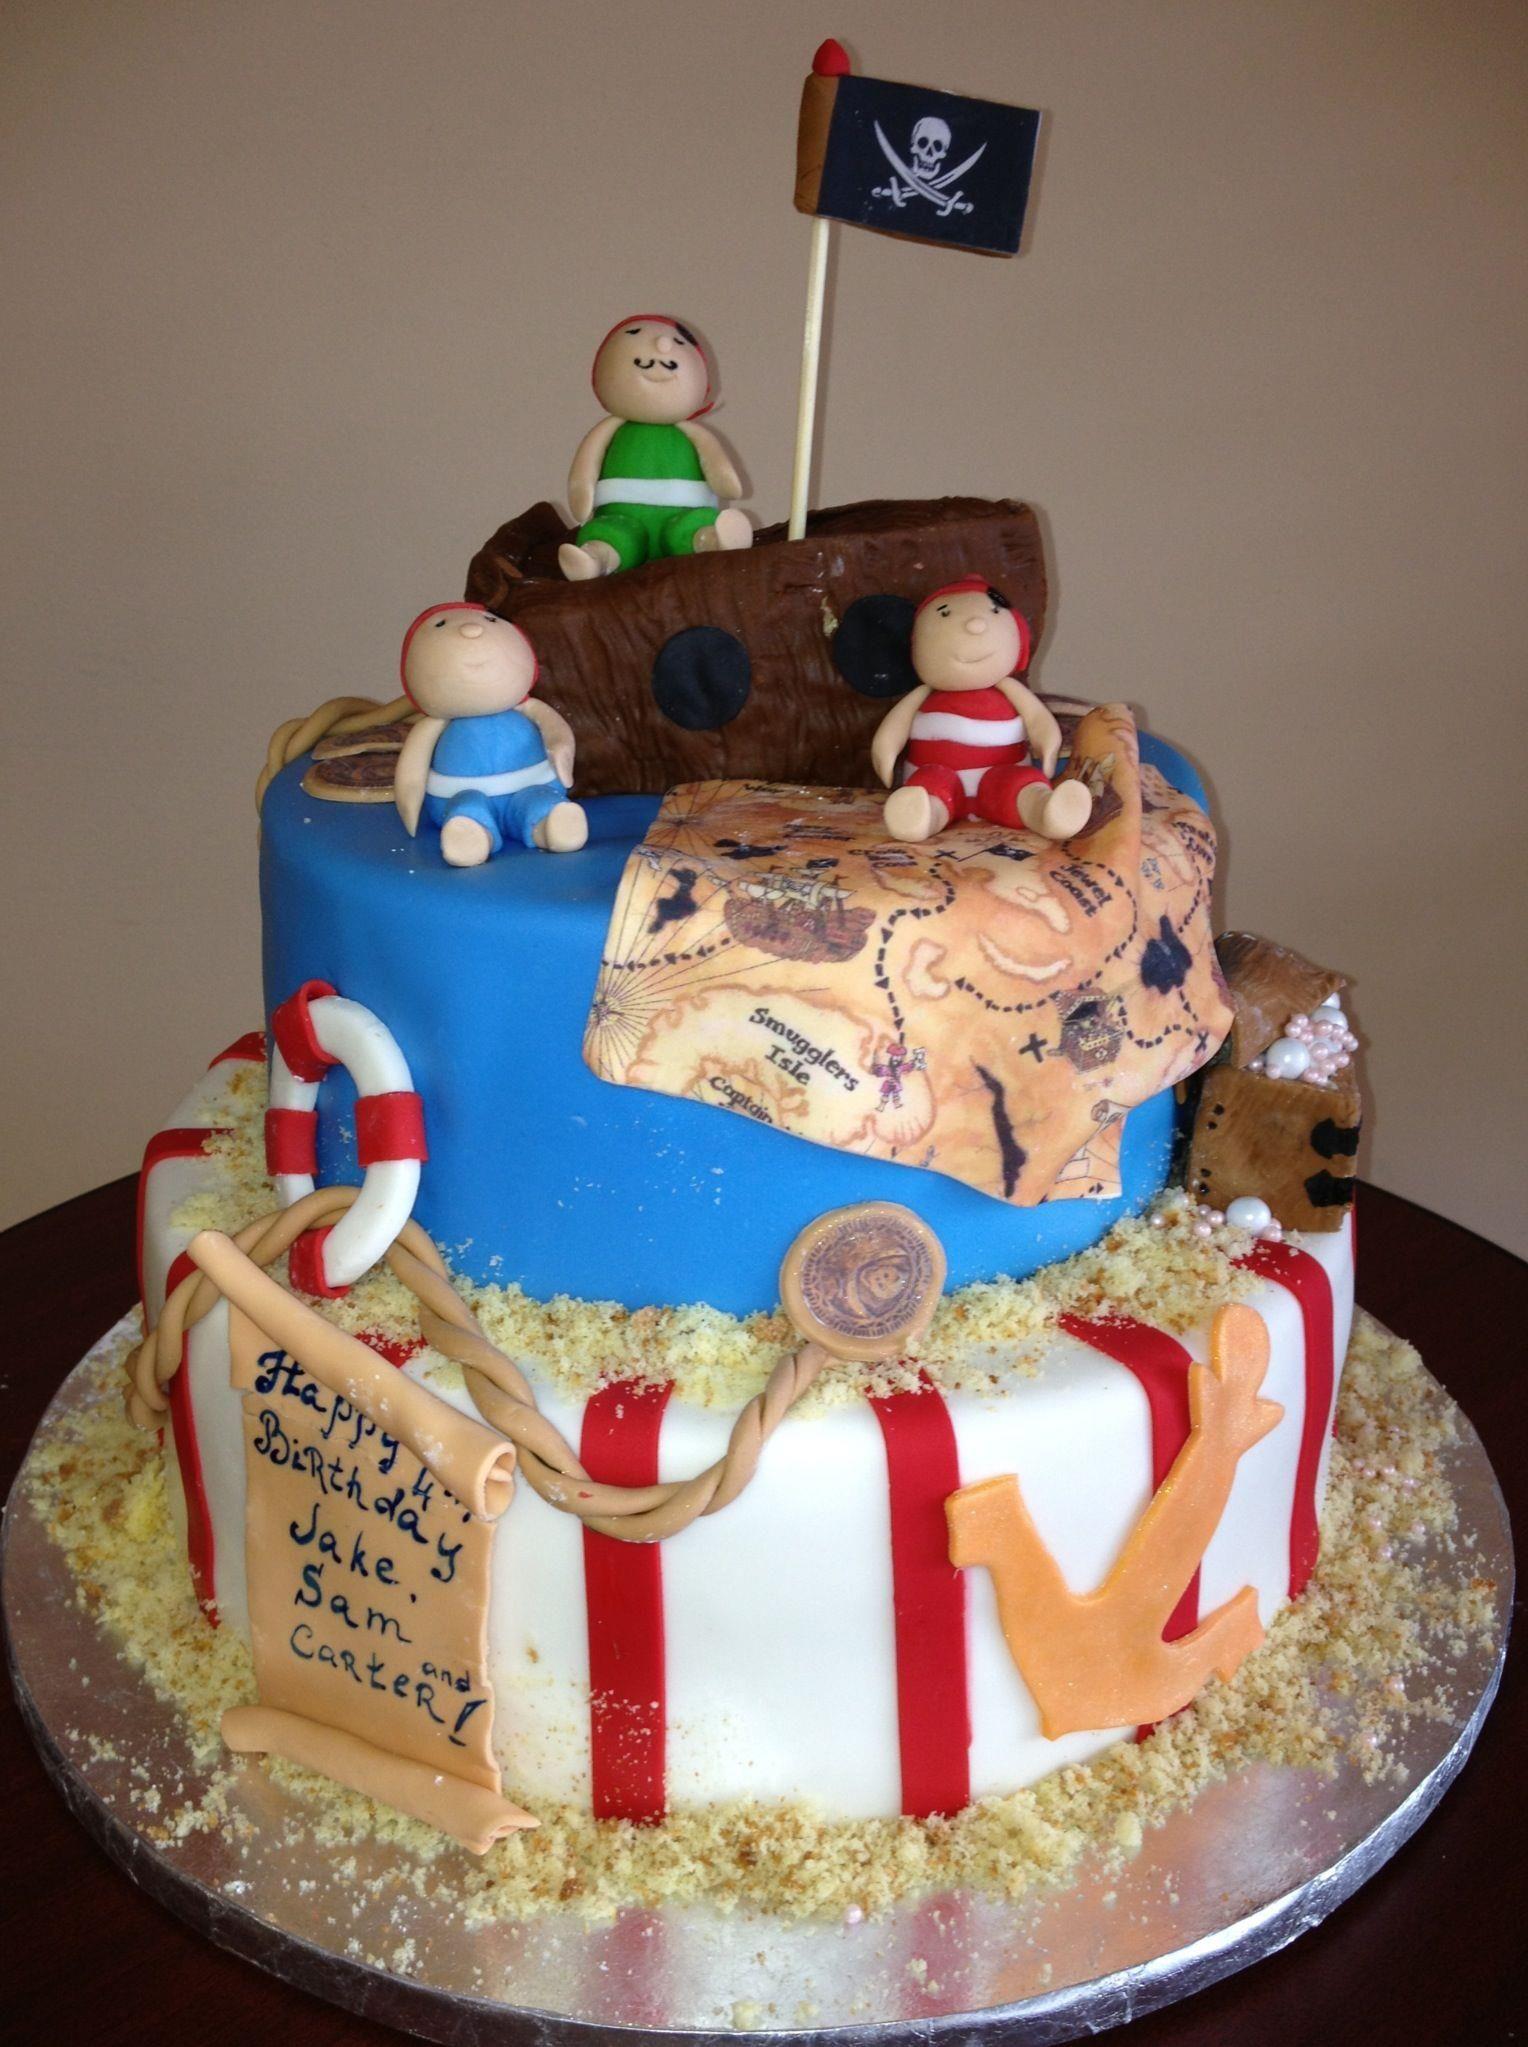 Pirate Birthday Cake By Roscoe Bakery Los Angeles CA Custom LA Cakes Like Funny Cute Nice Kids Party